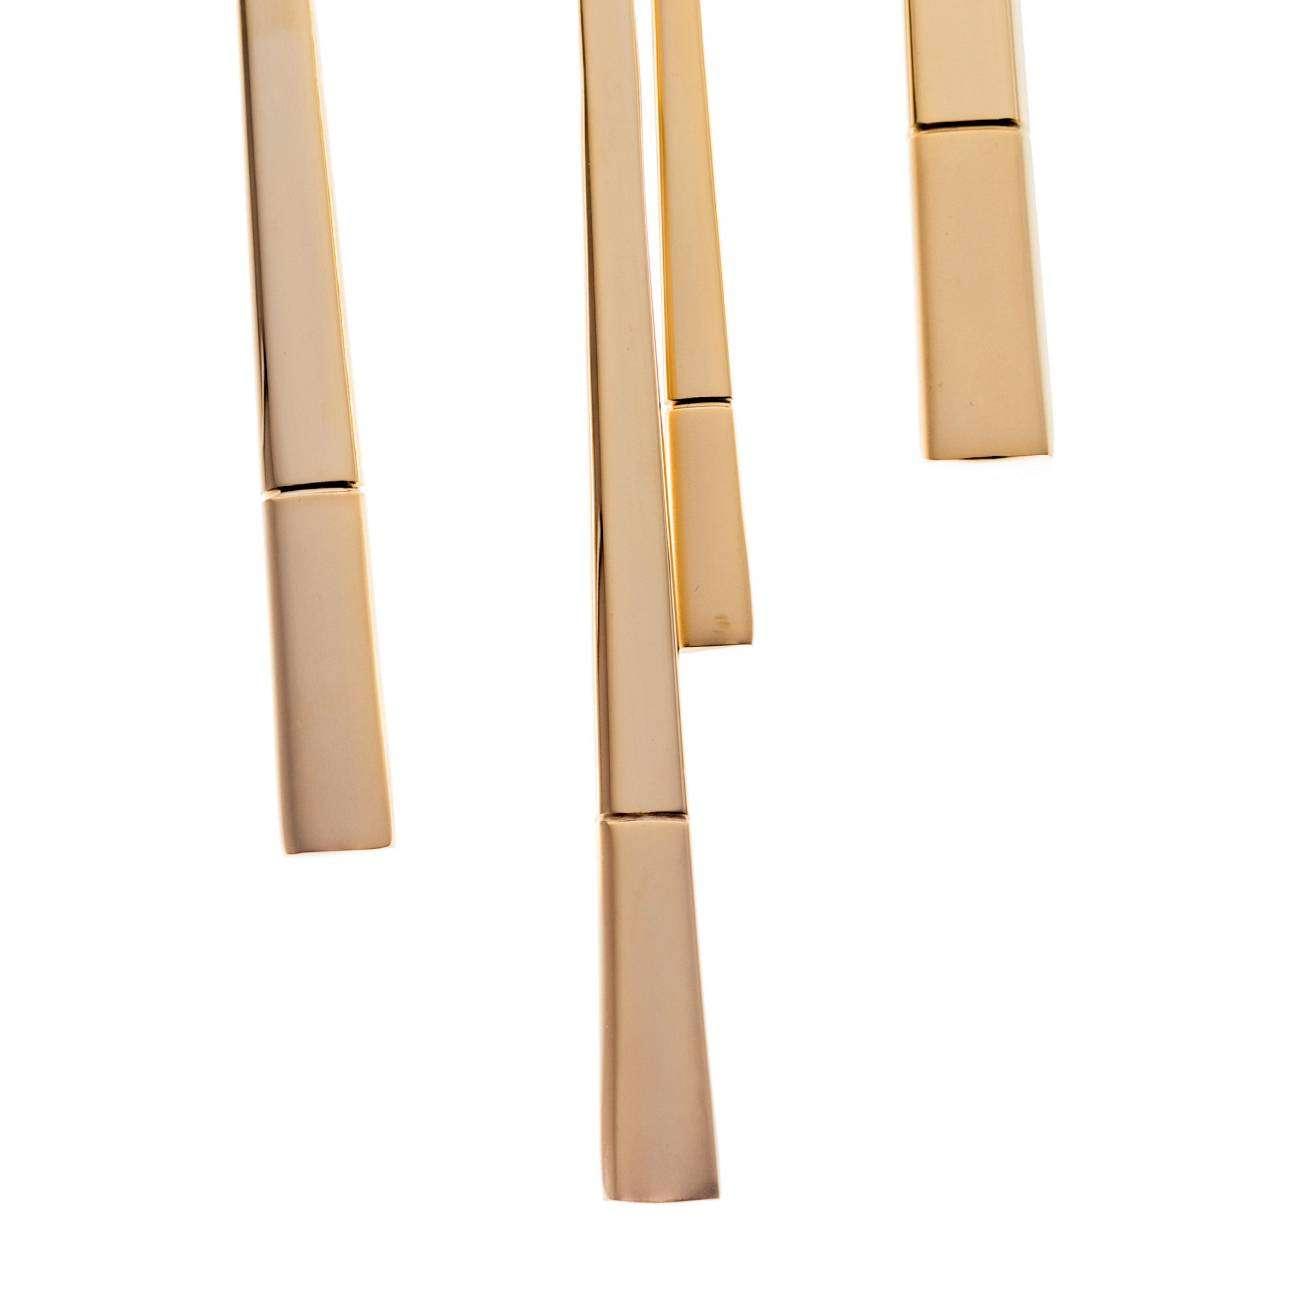 Sztućce Luxus Gold komplet dla 6 osób 24 części 43,5x32,5x6cm